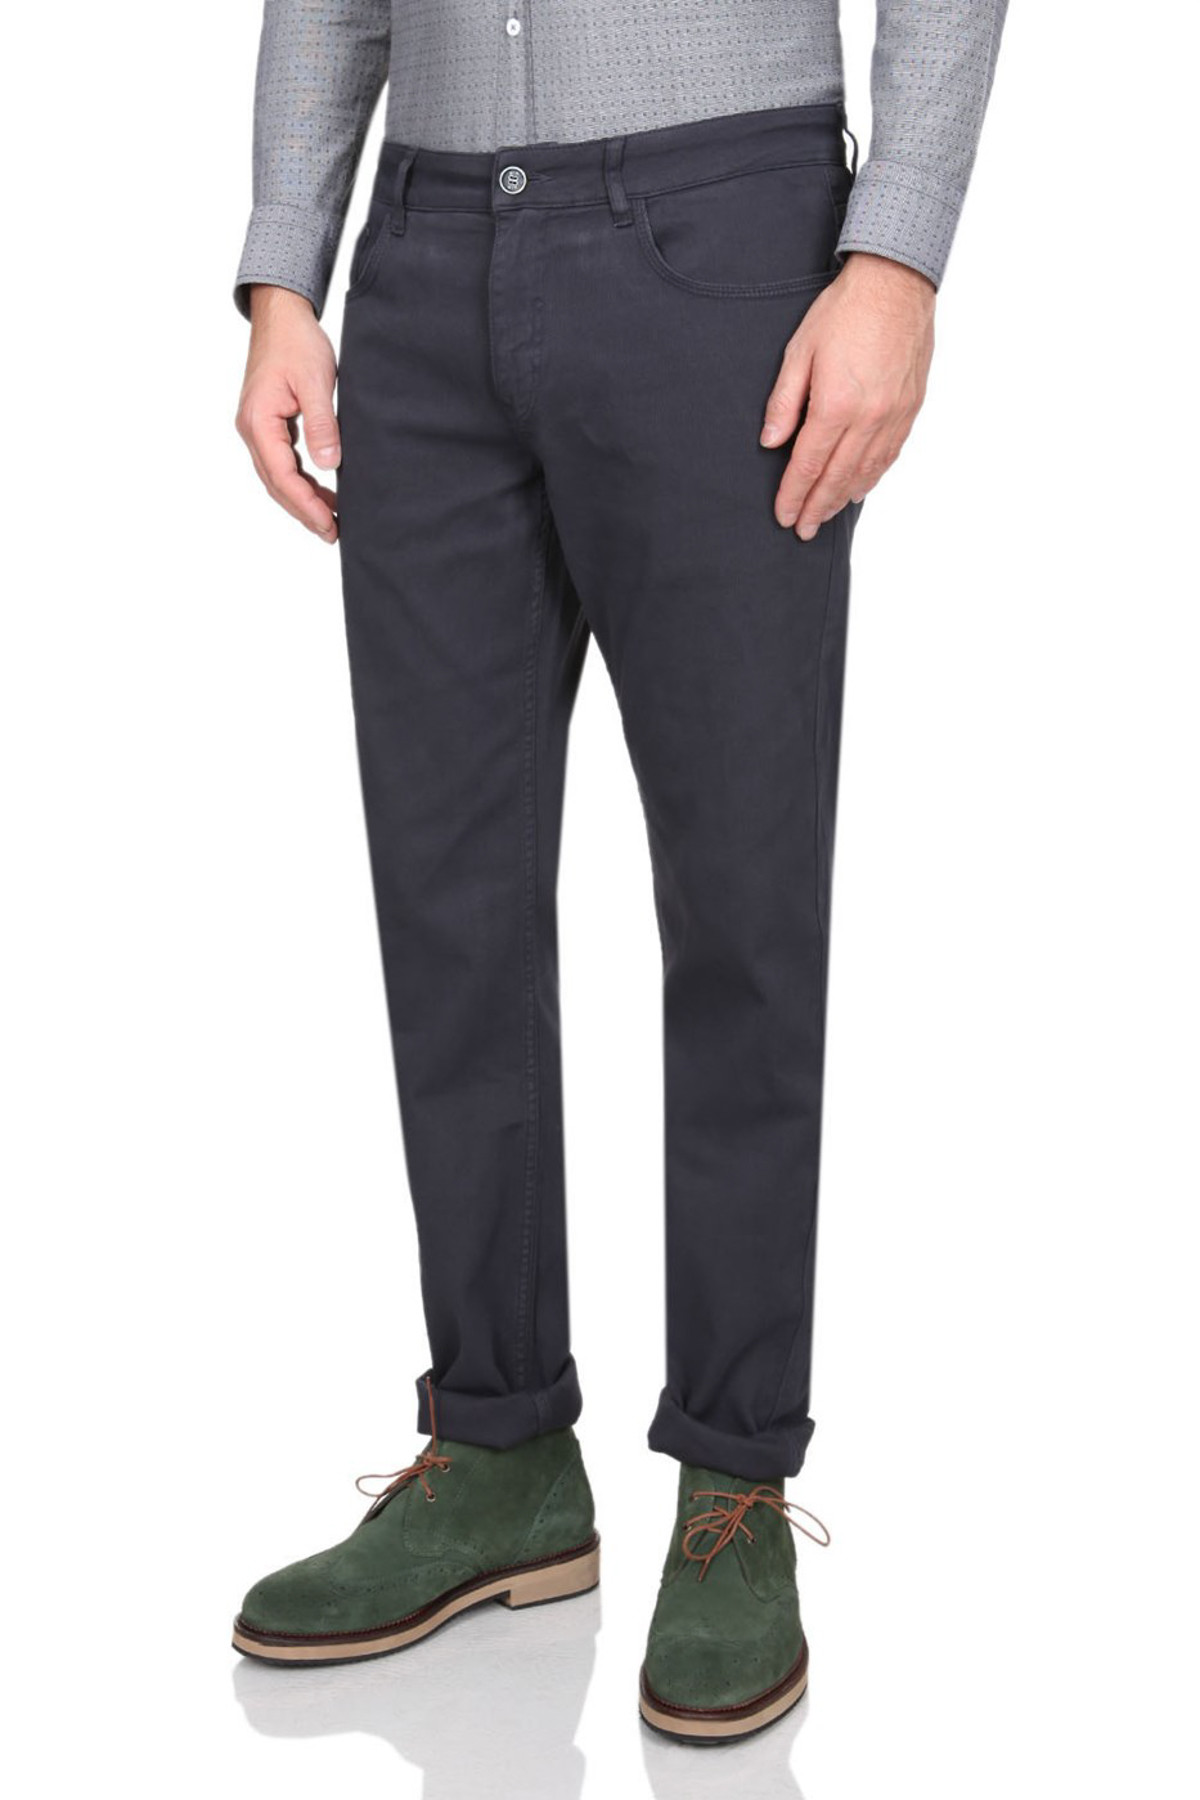 Regular Fit Spor Pantolon - KP10072036